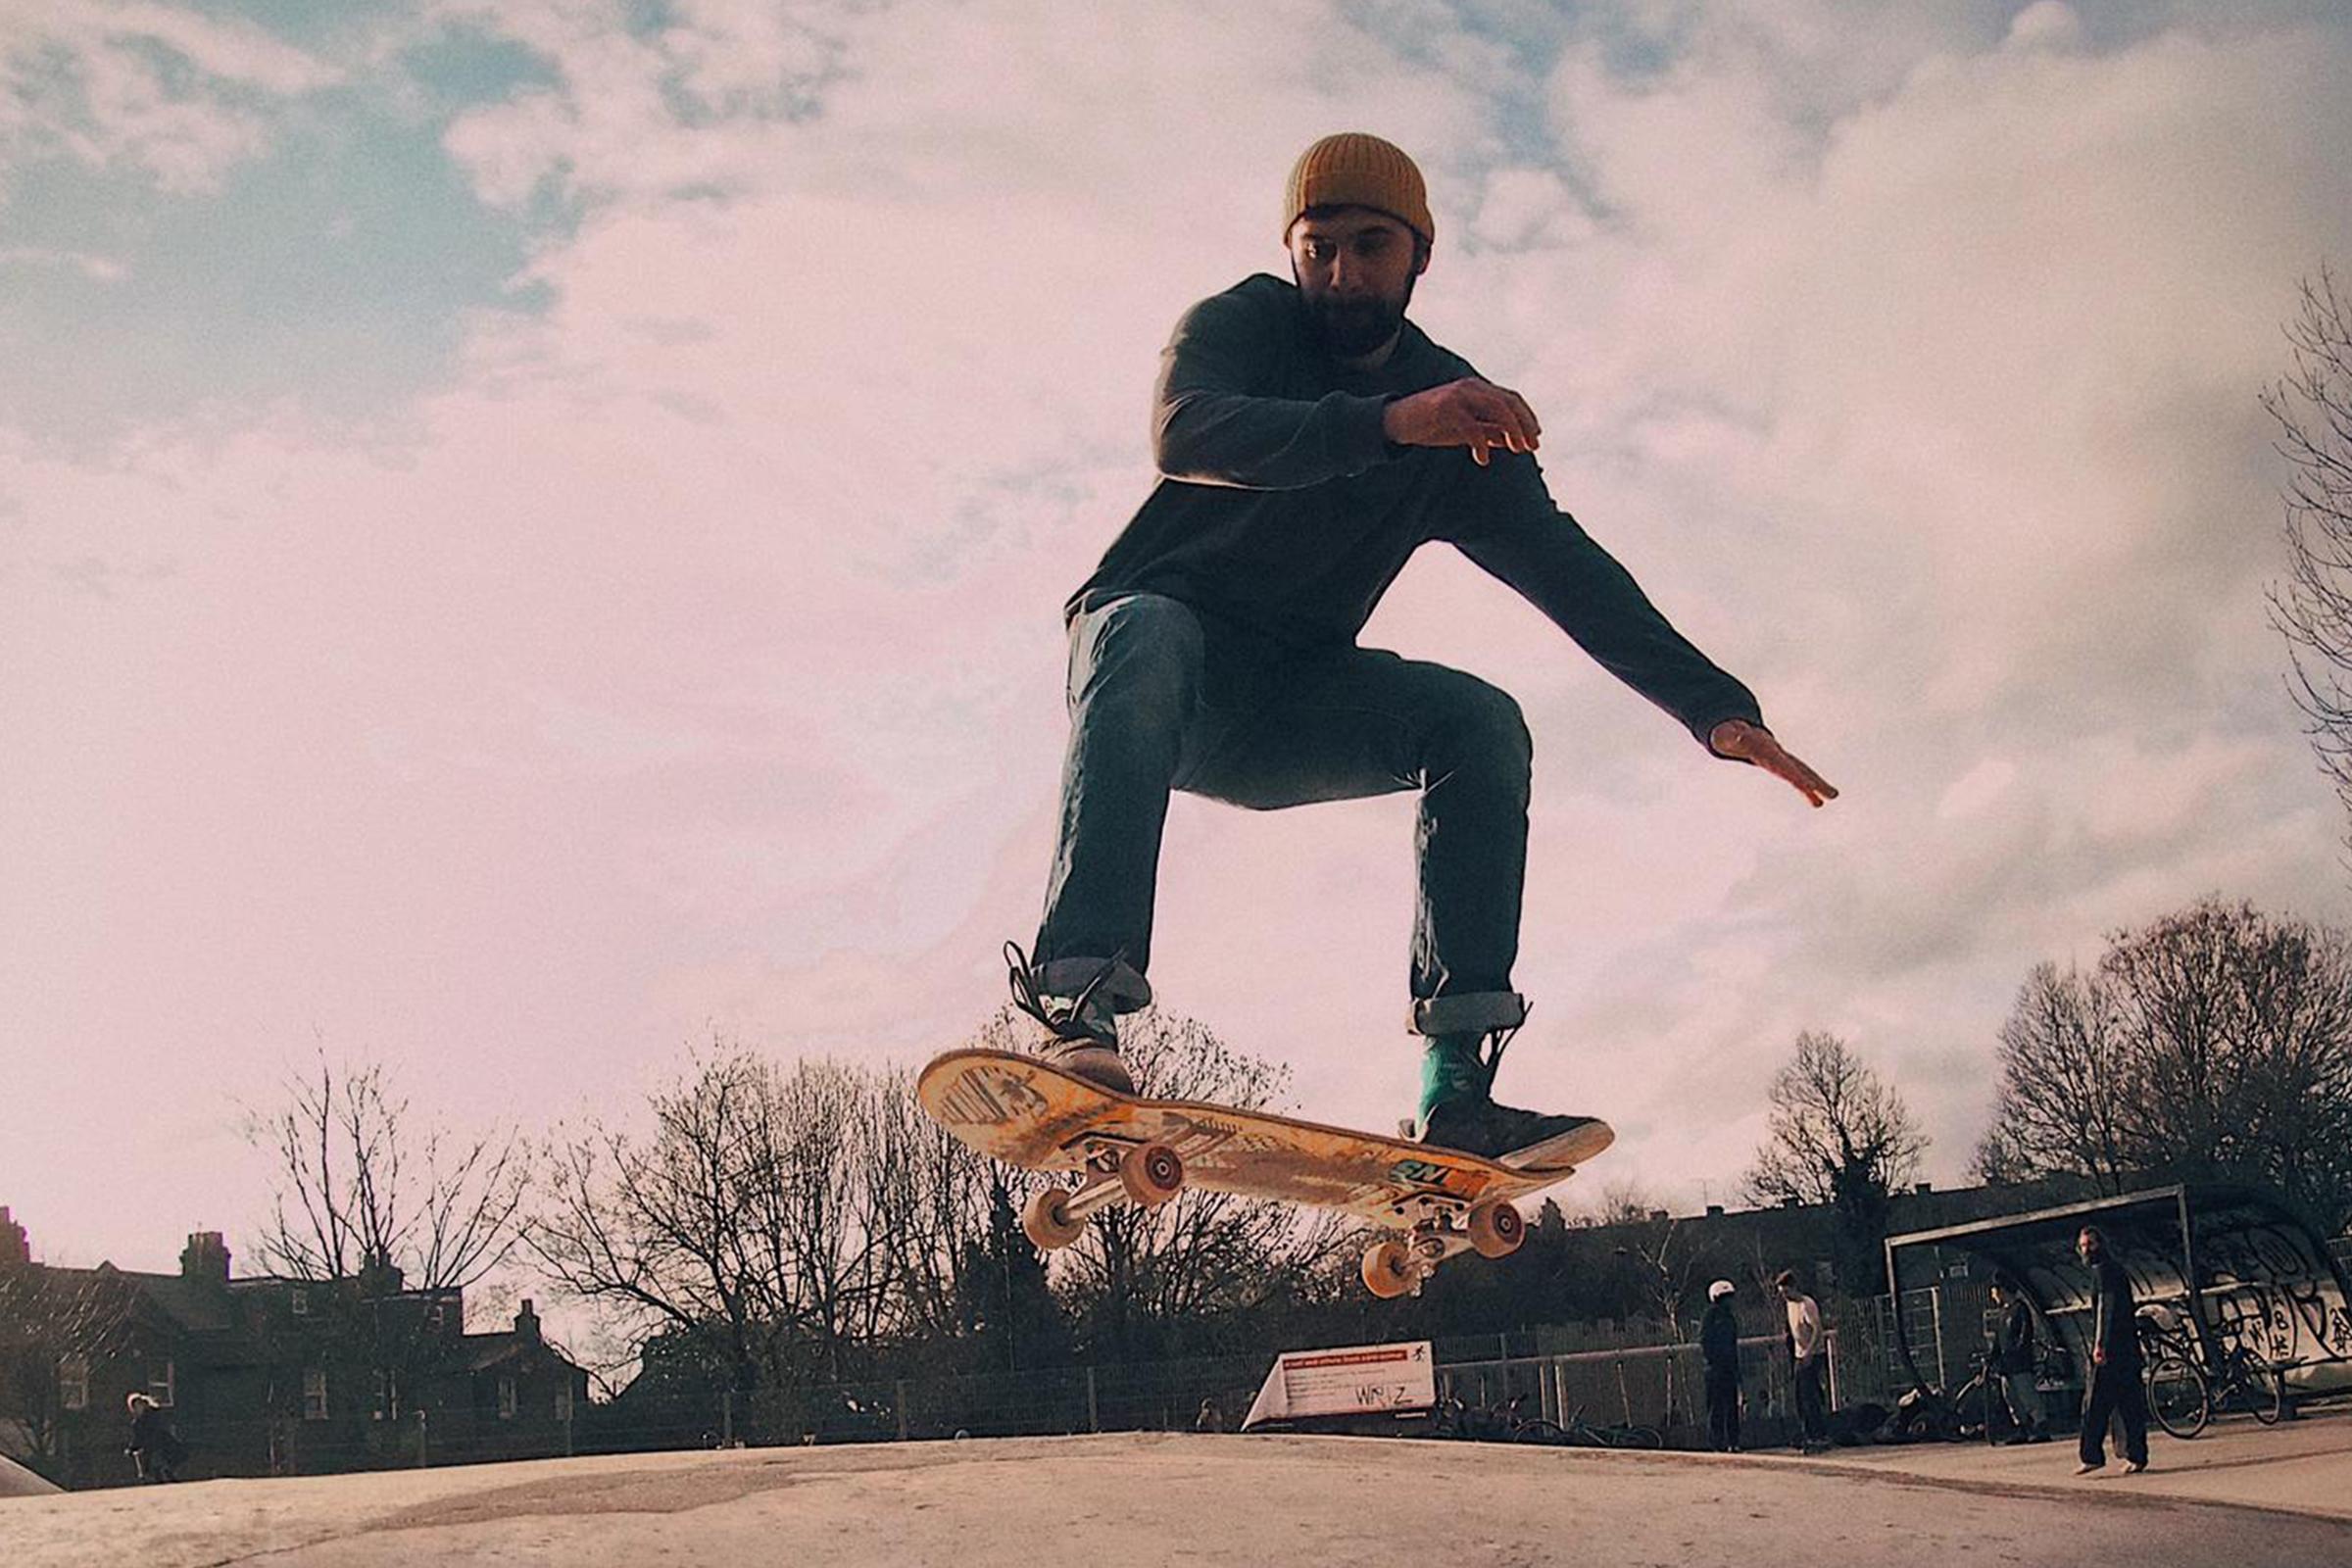 Skateboard Leon Nikoo